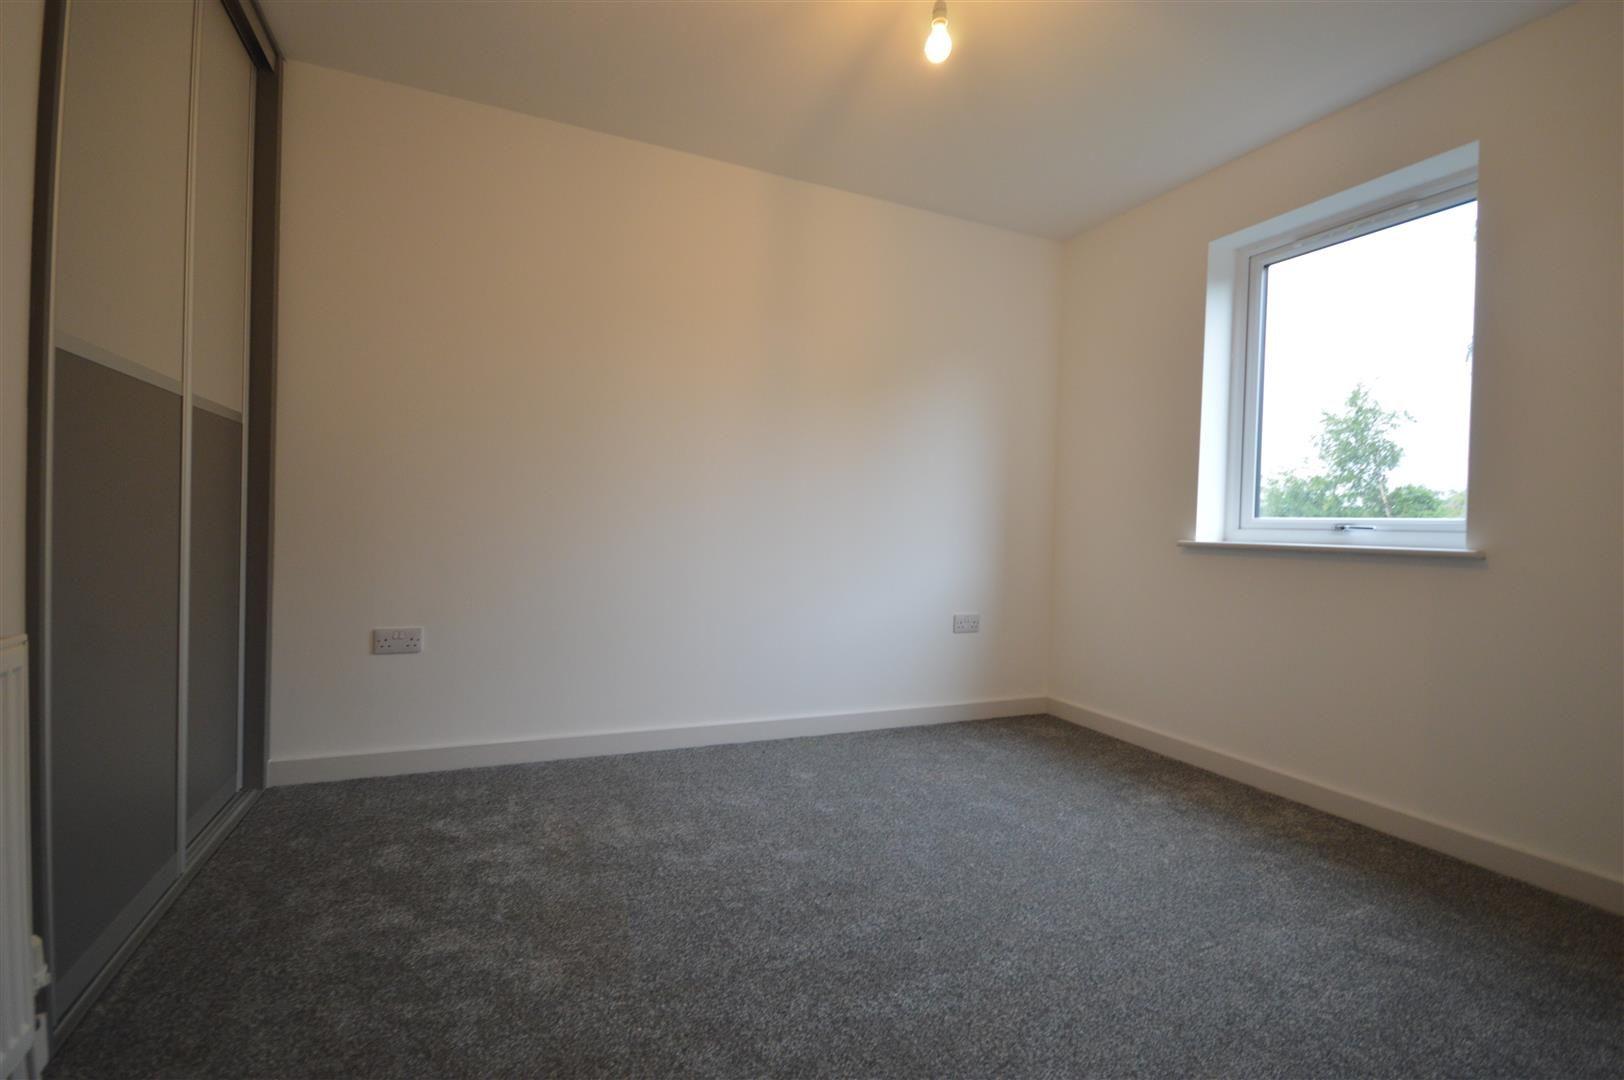 2 bed detached for sale in Leominster 9